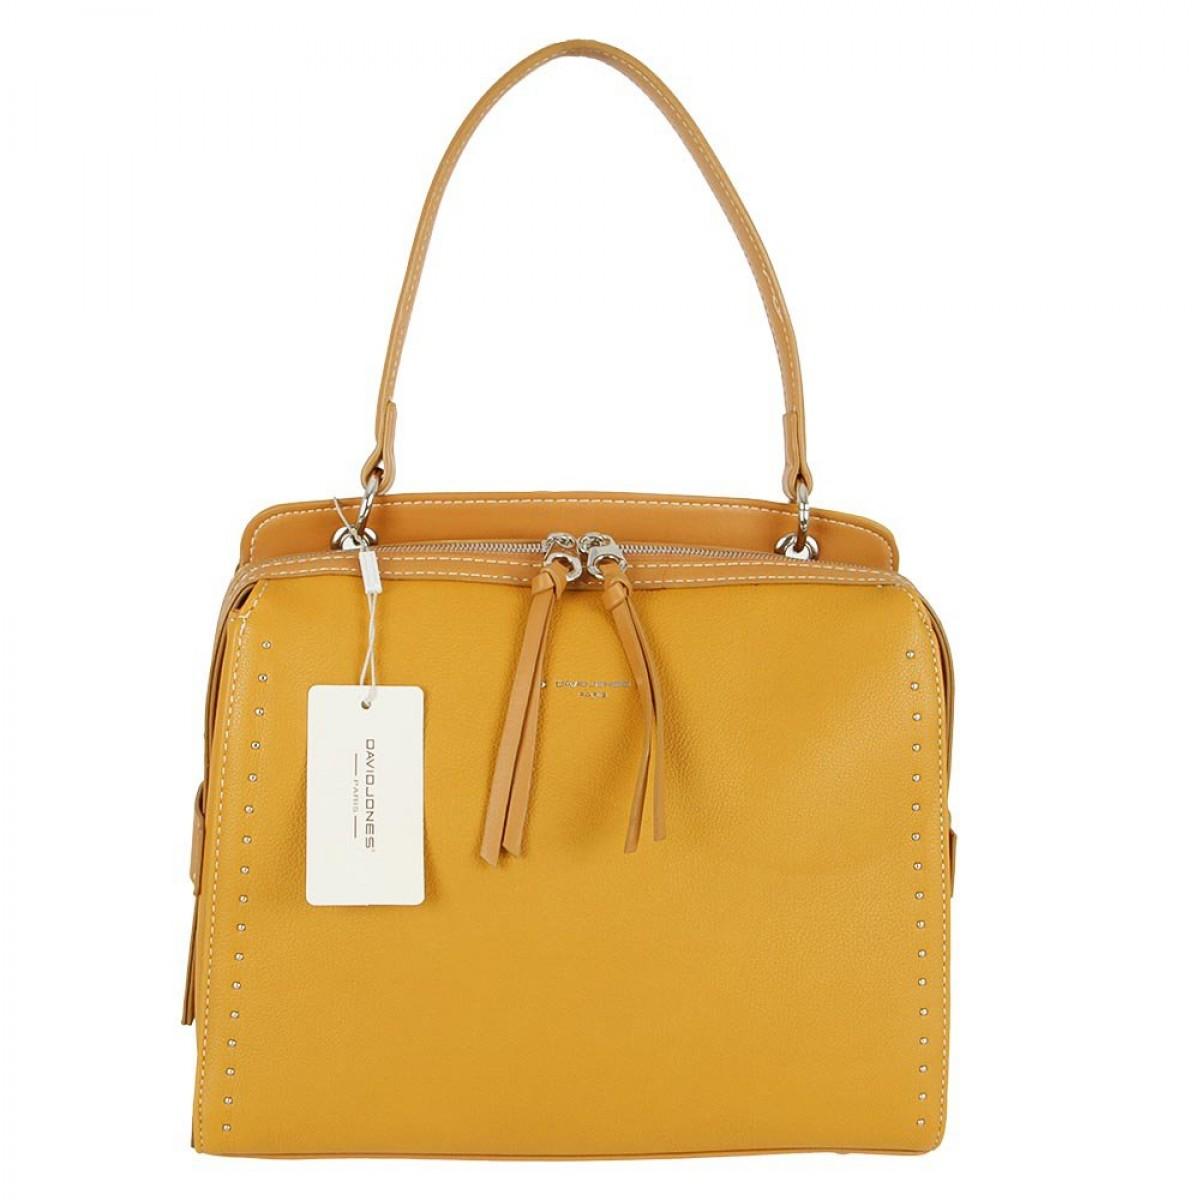 Жіноча сумка David Jones CM5459 MUSTARD